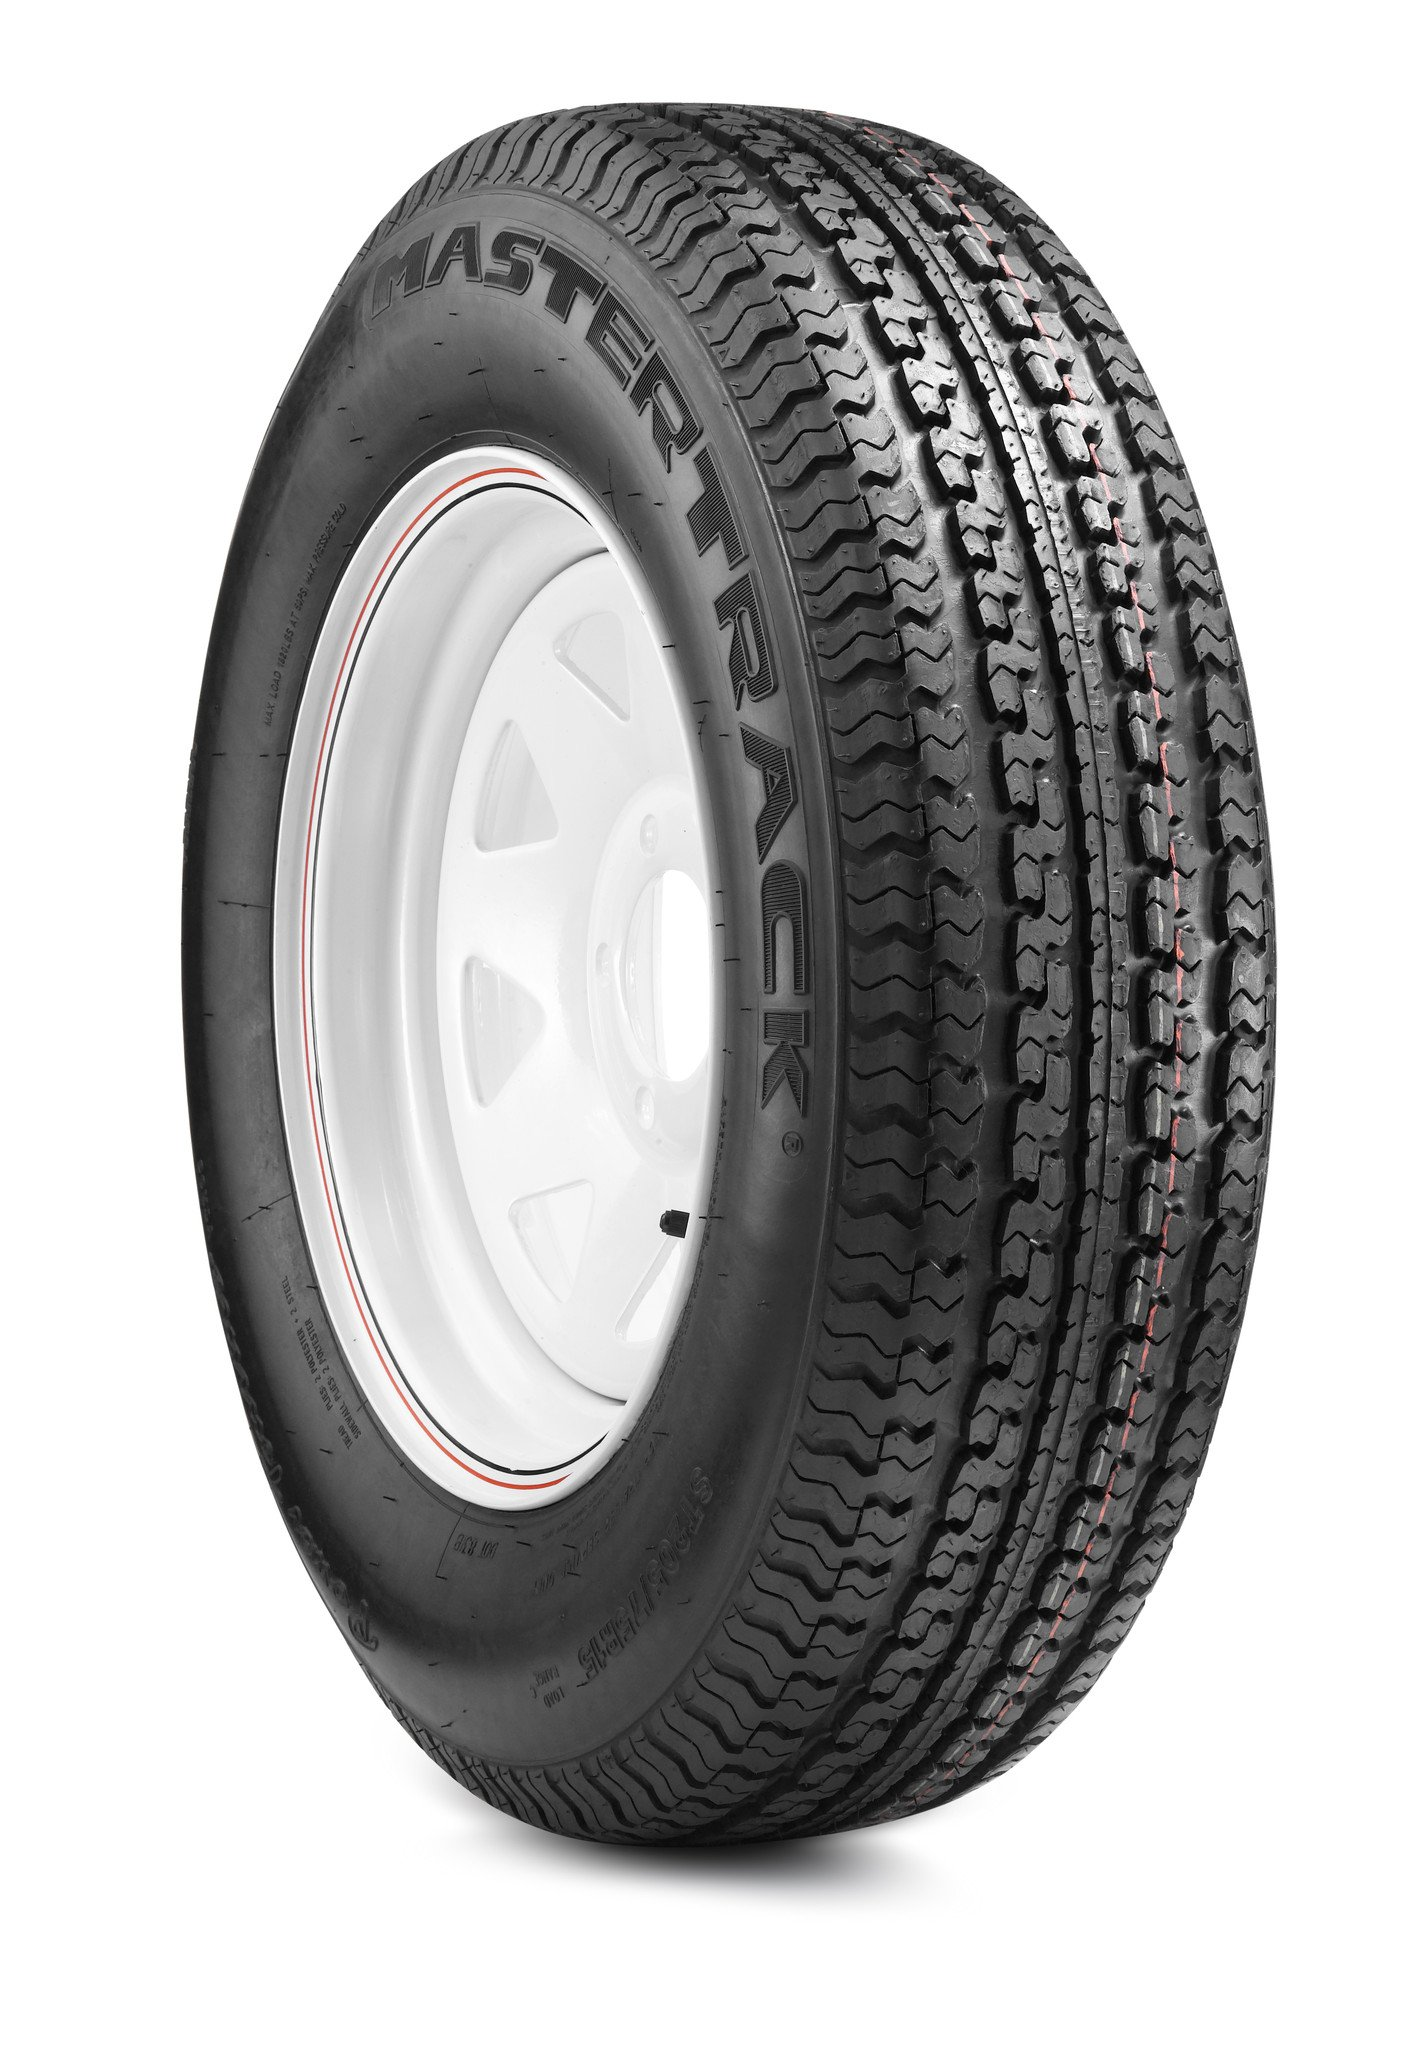 Mastertrack Radial Trailer Trailer Radial Tire -205/75R15 101Q